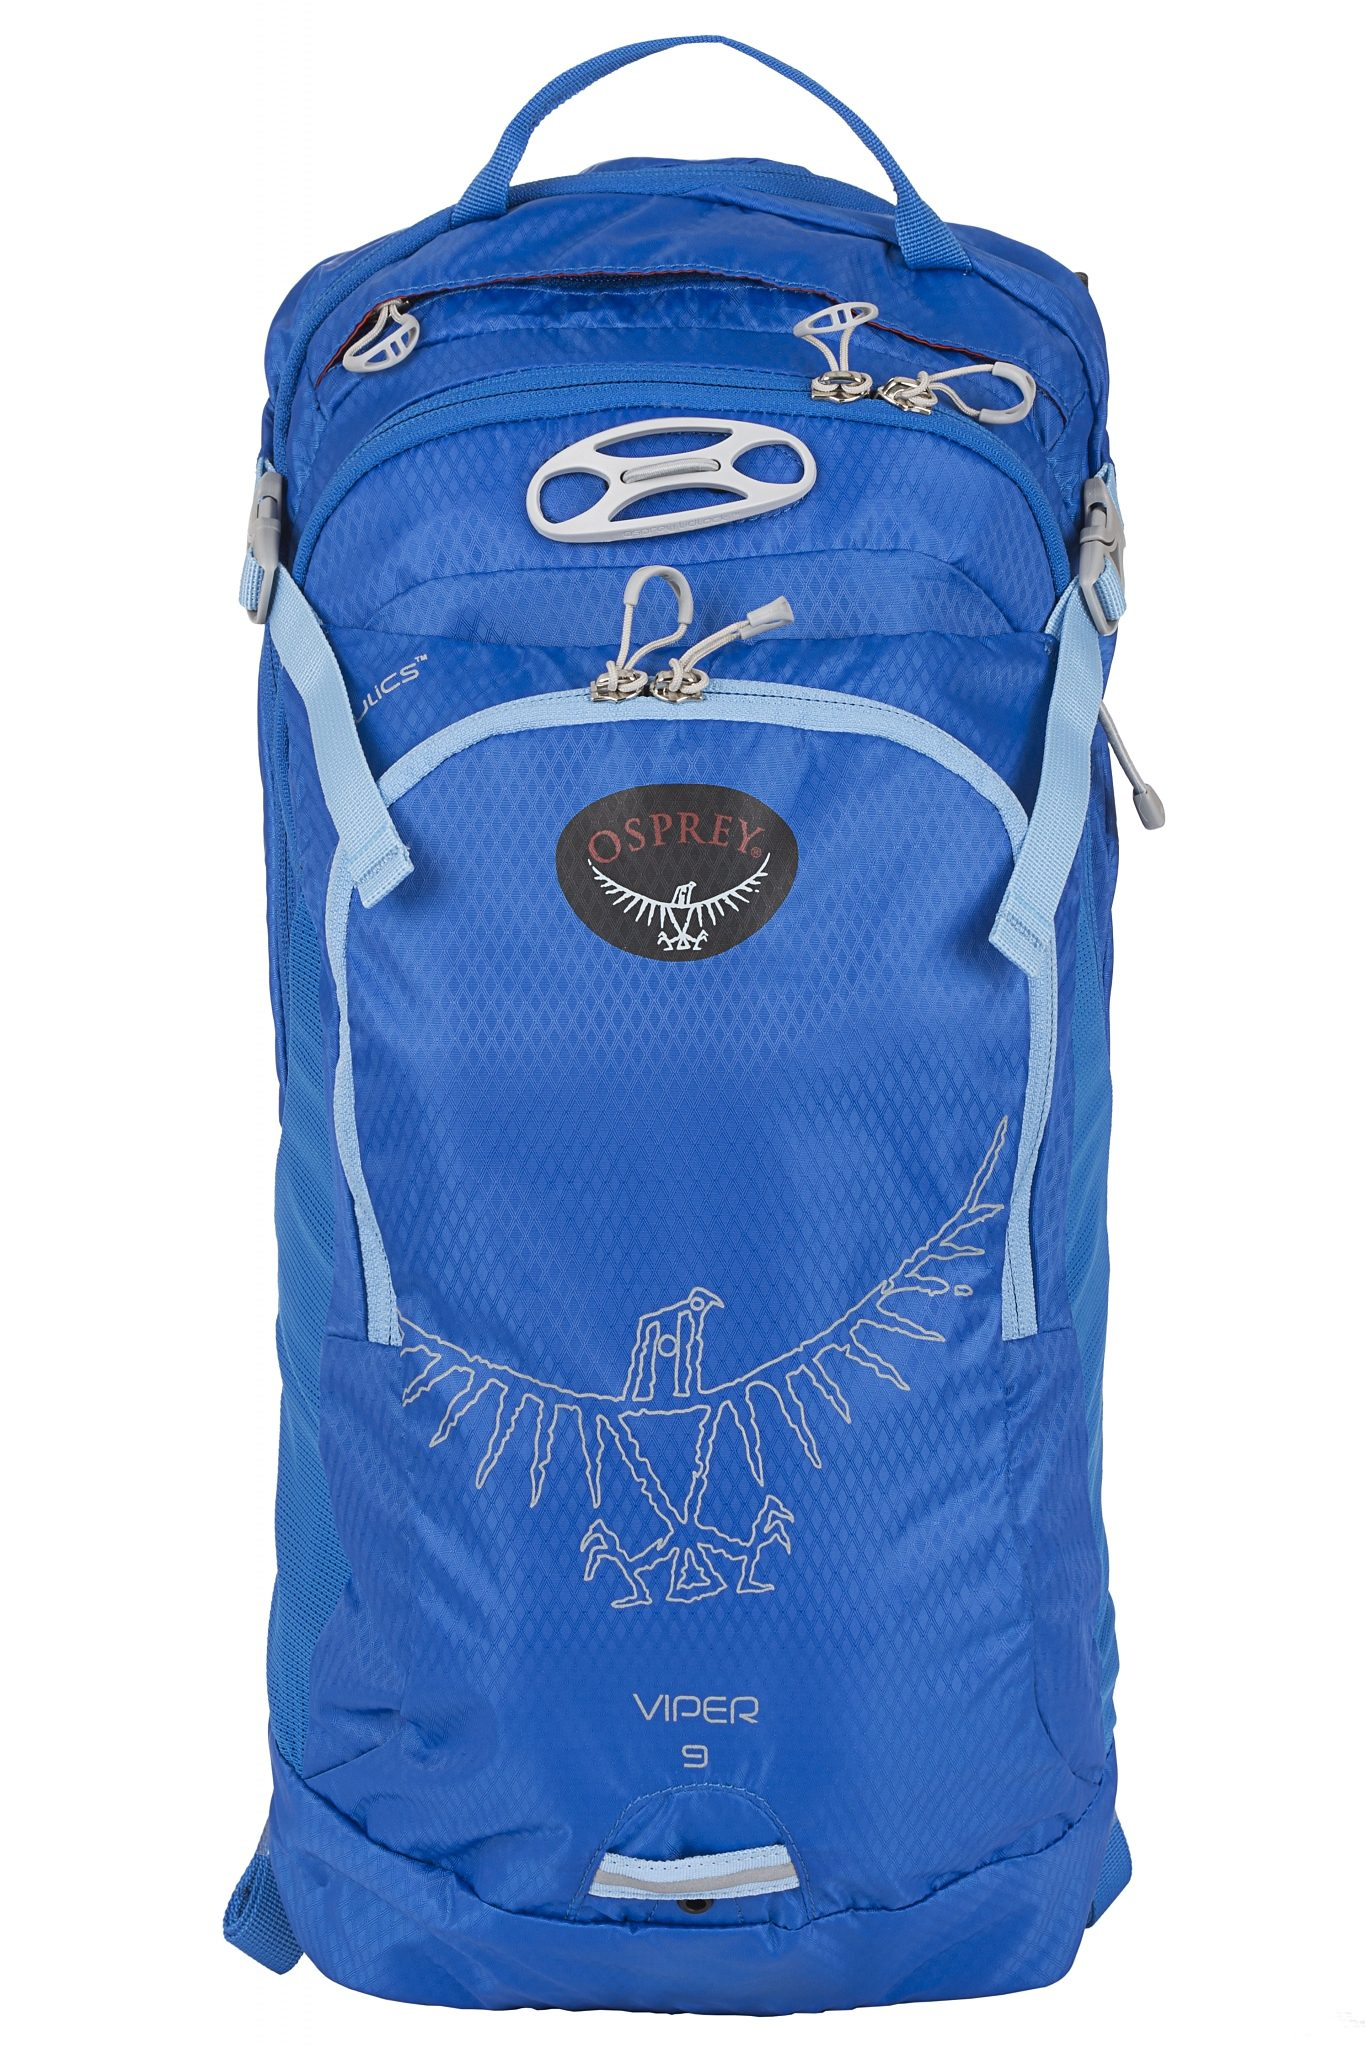 Osprey Rucksack »Viper 9 Rucksack Men«